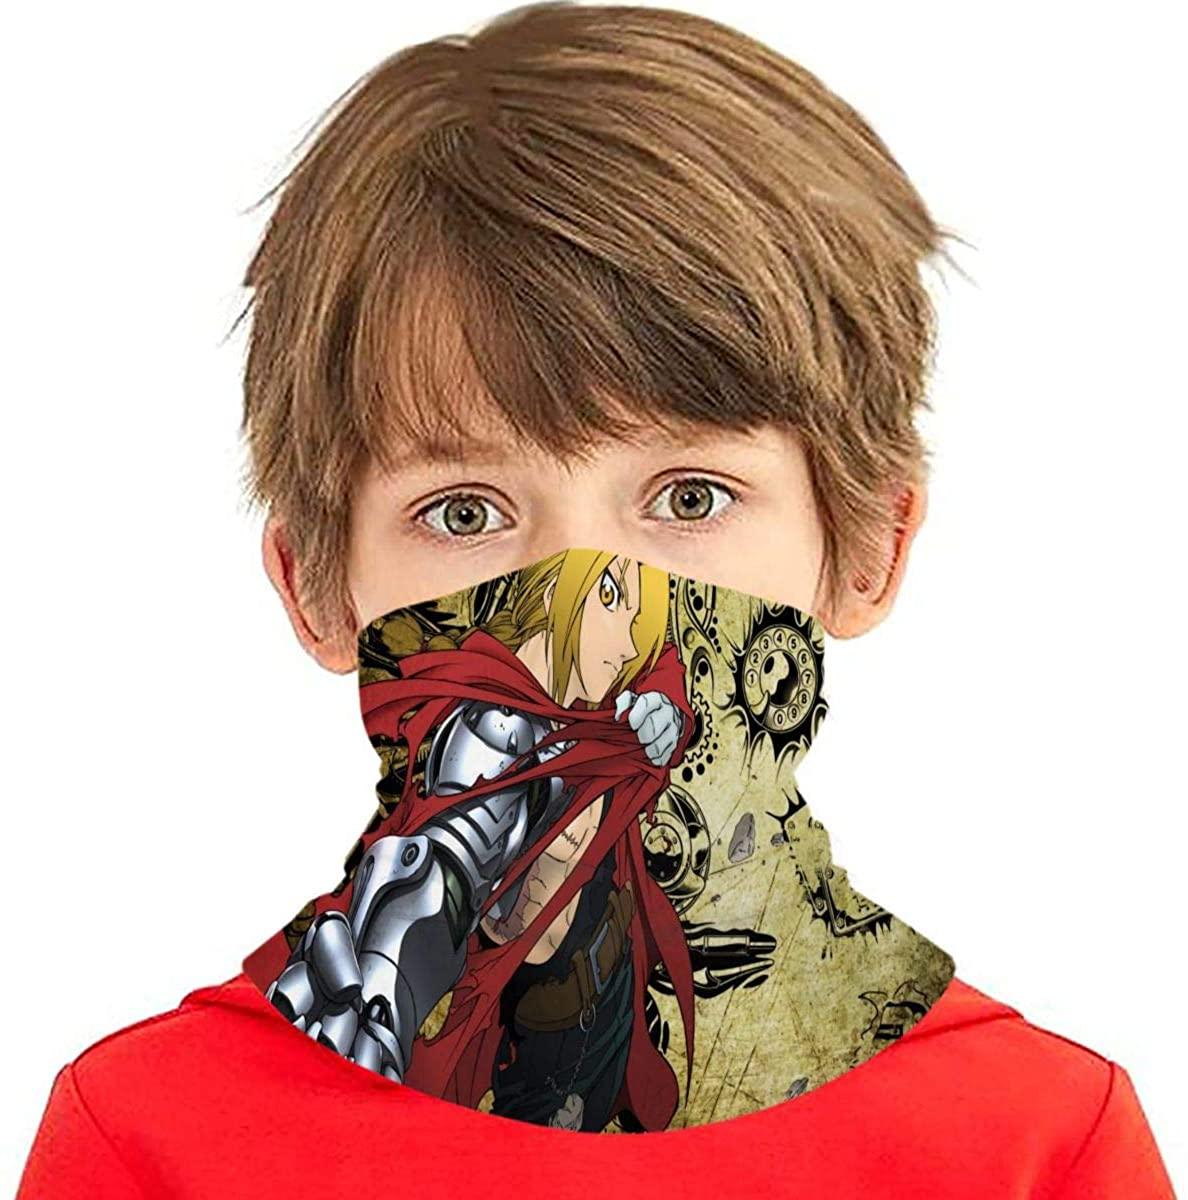 Fullmetal Alchemist Boys Ice Silk Balaclava Dustproof Face Masks for Cycling Neck Guard